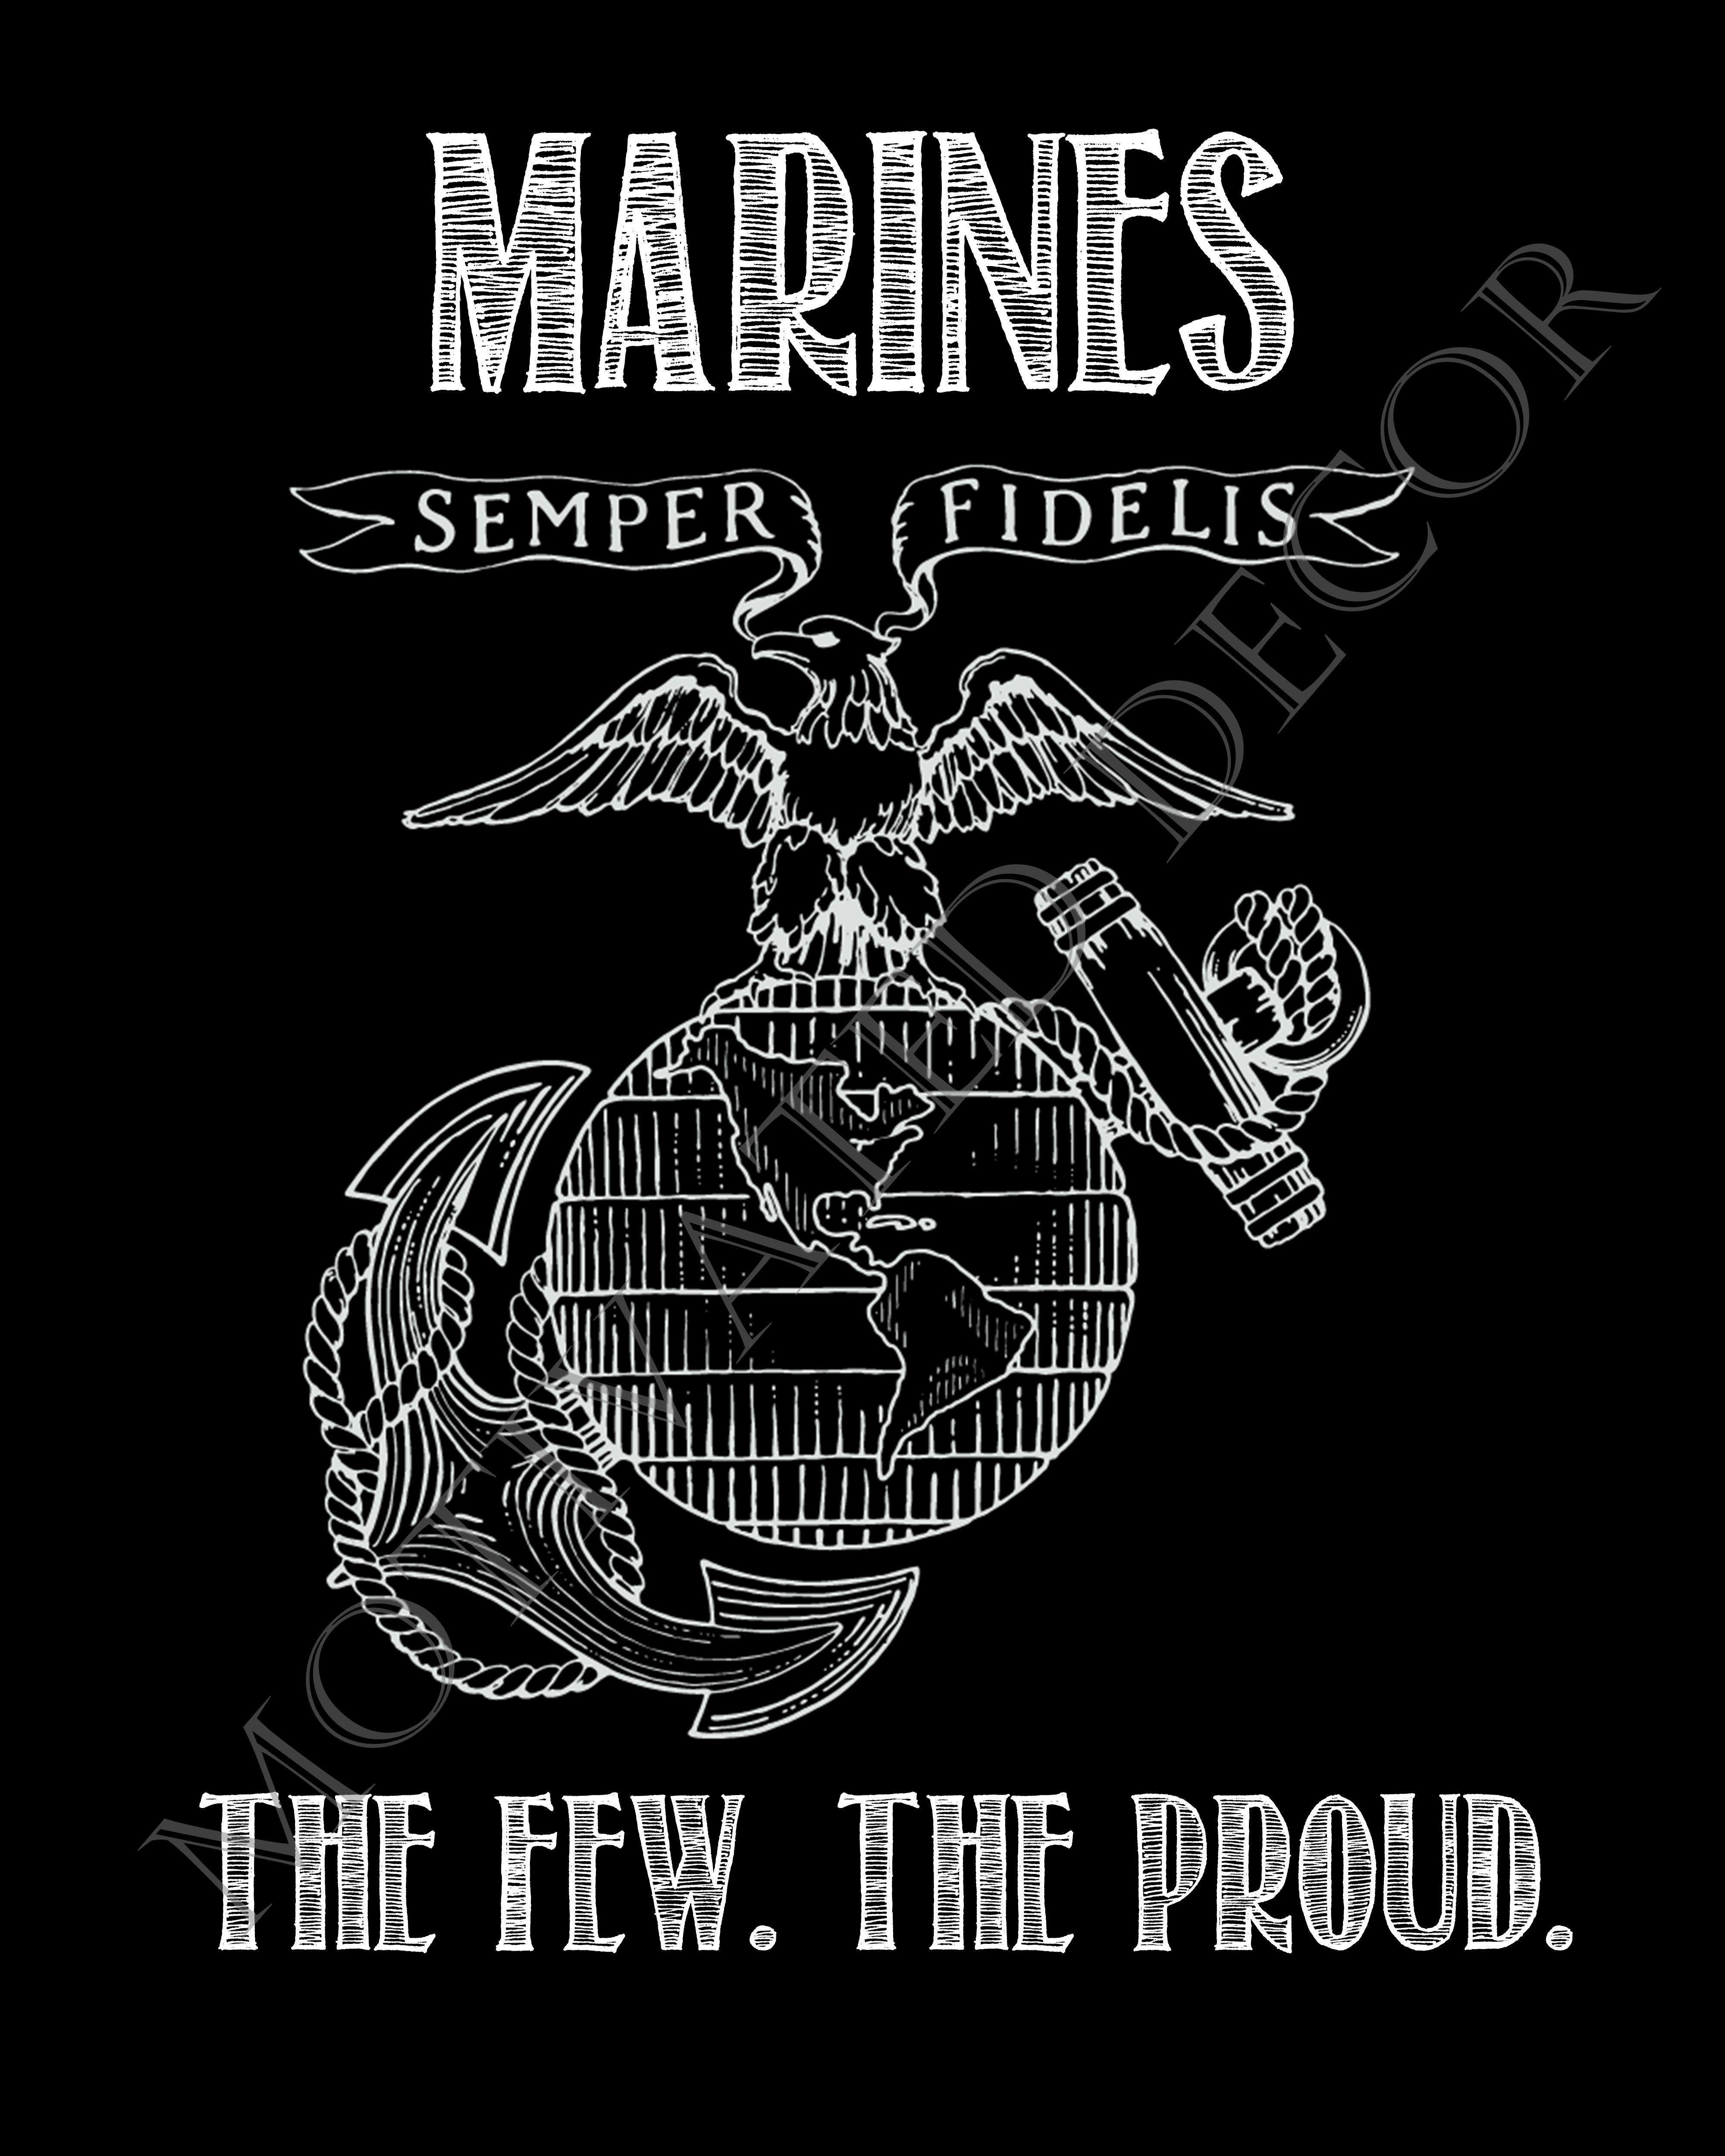 United States Marines 238th Birthday Celebration Marines